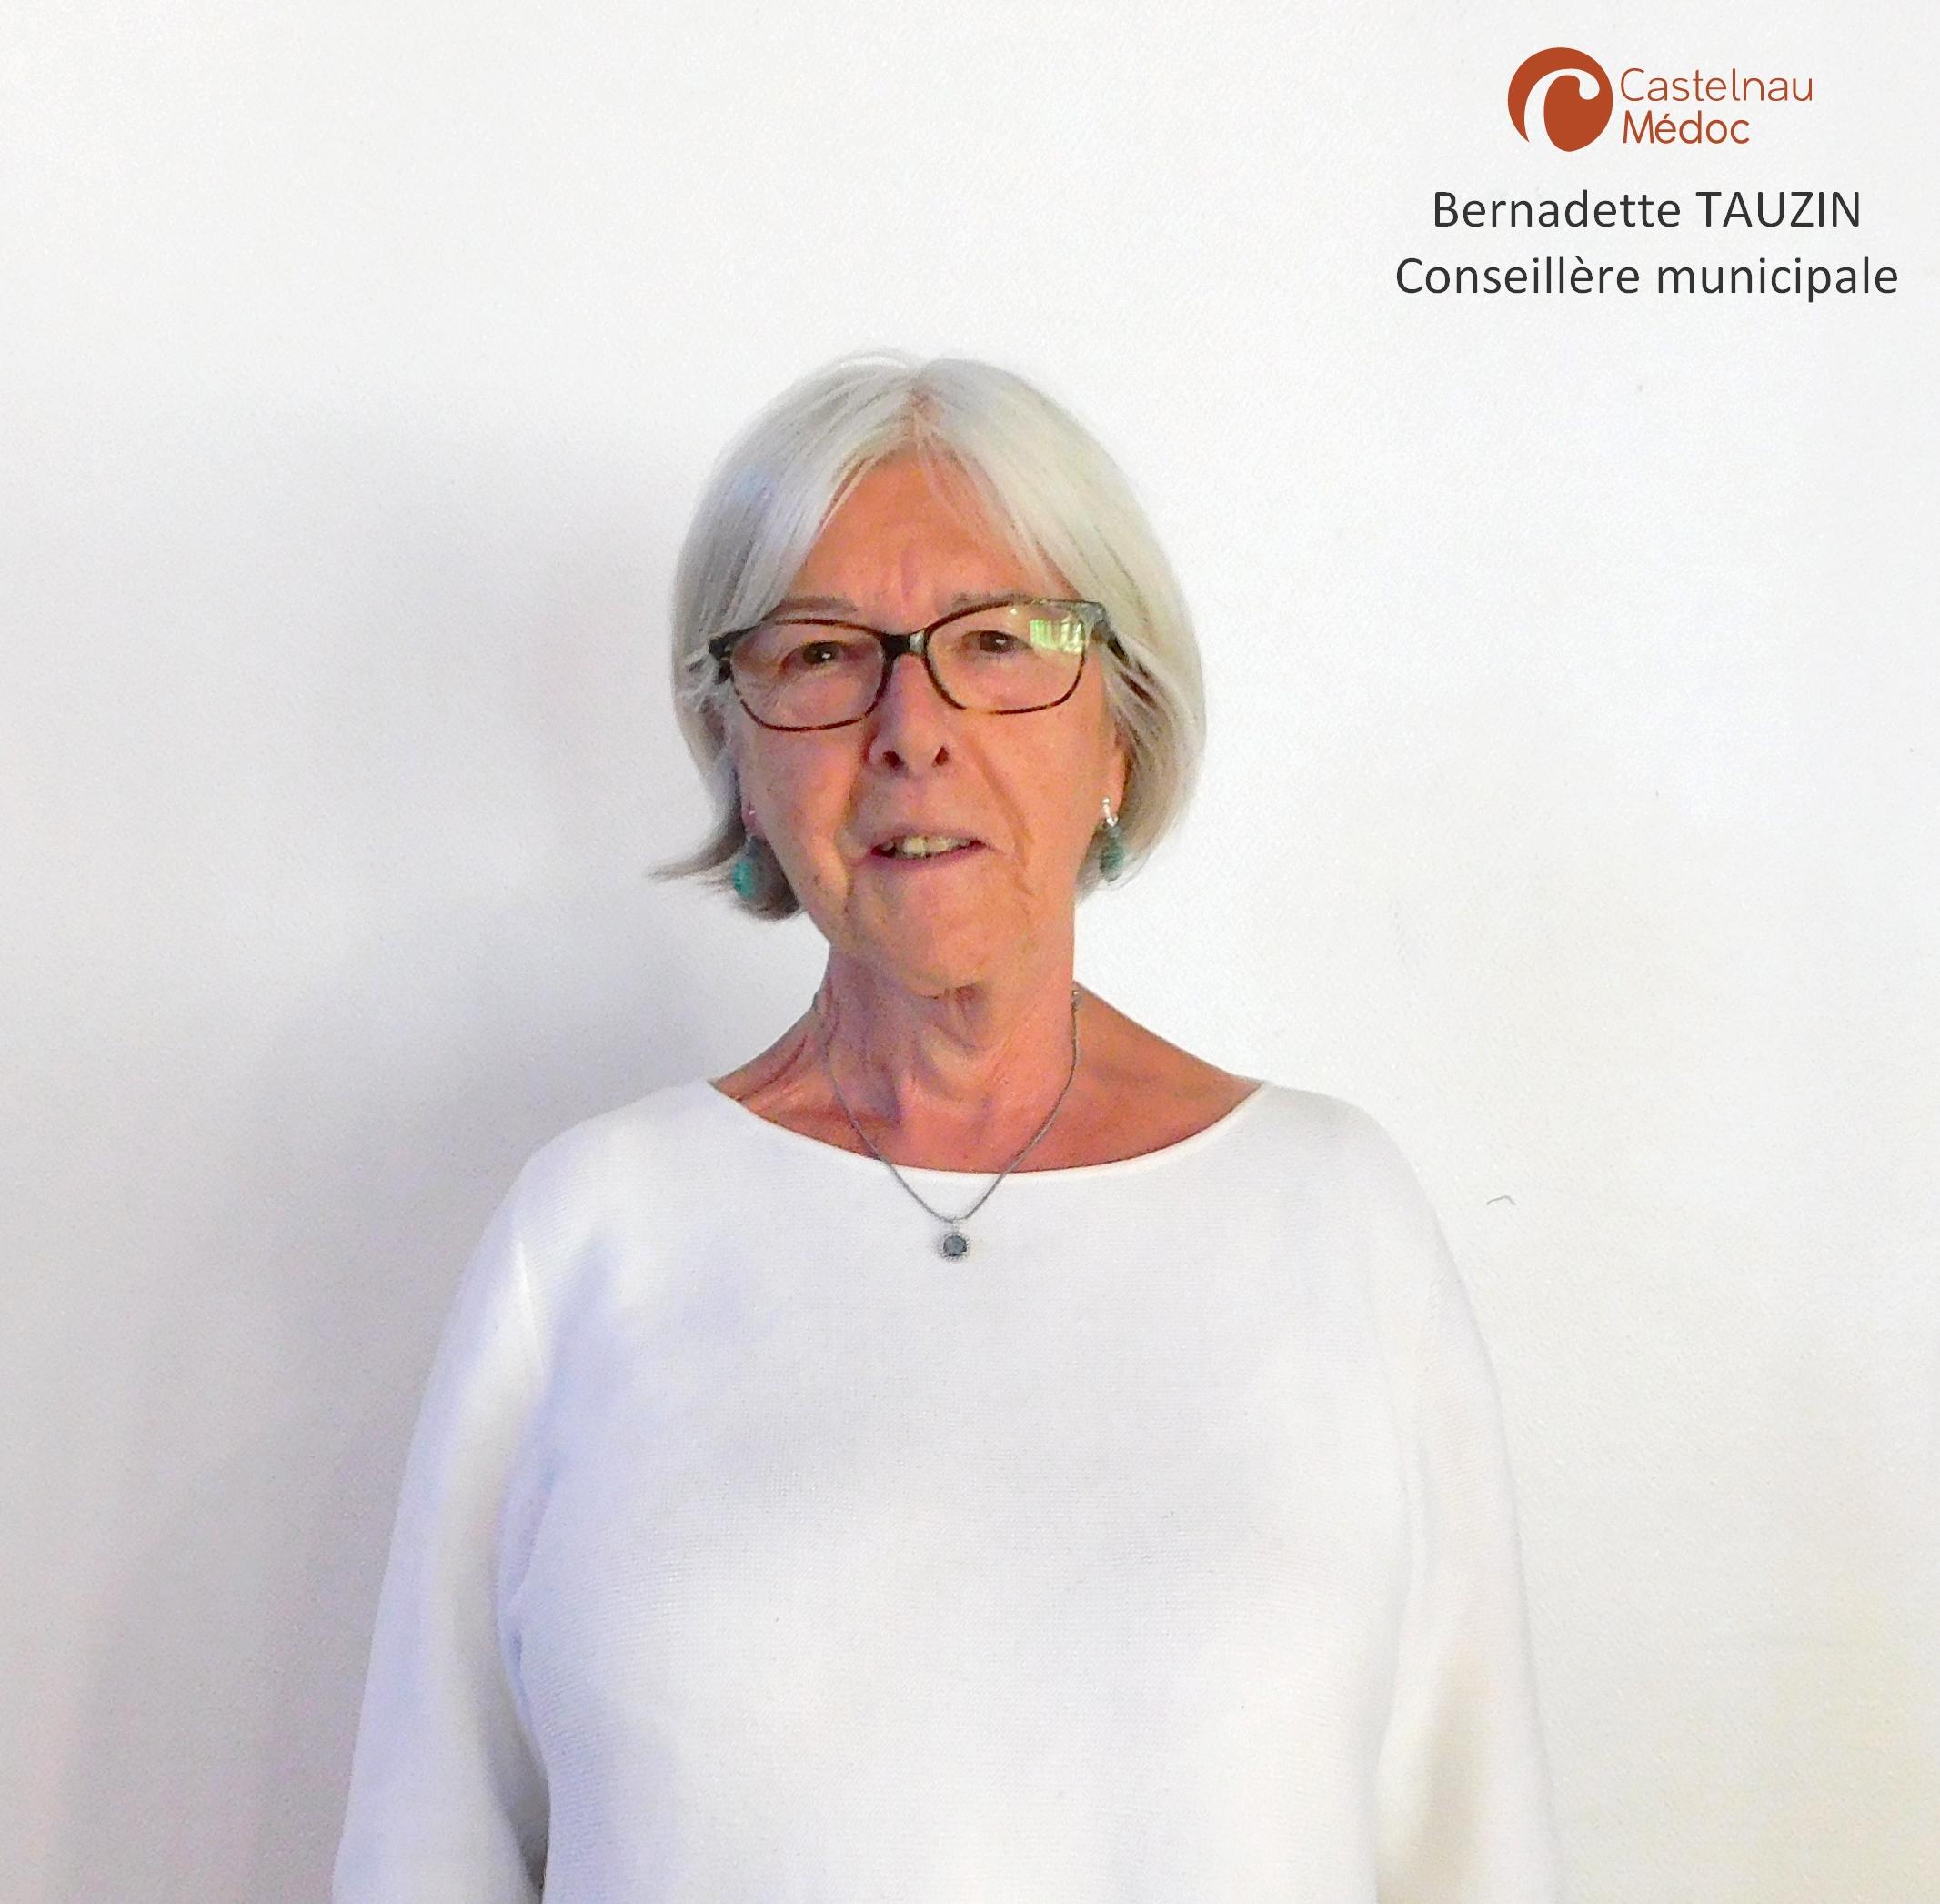 Bernadette TAUZIN